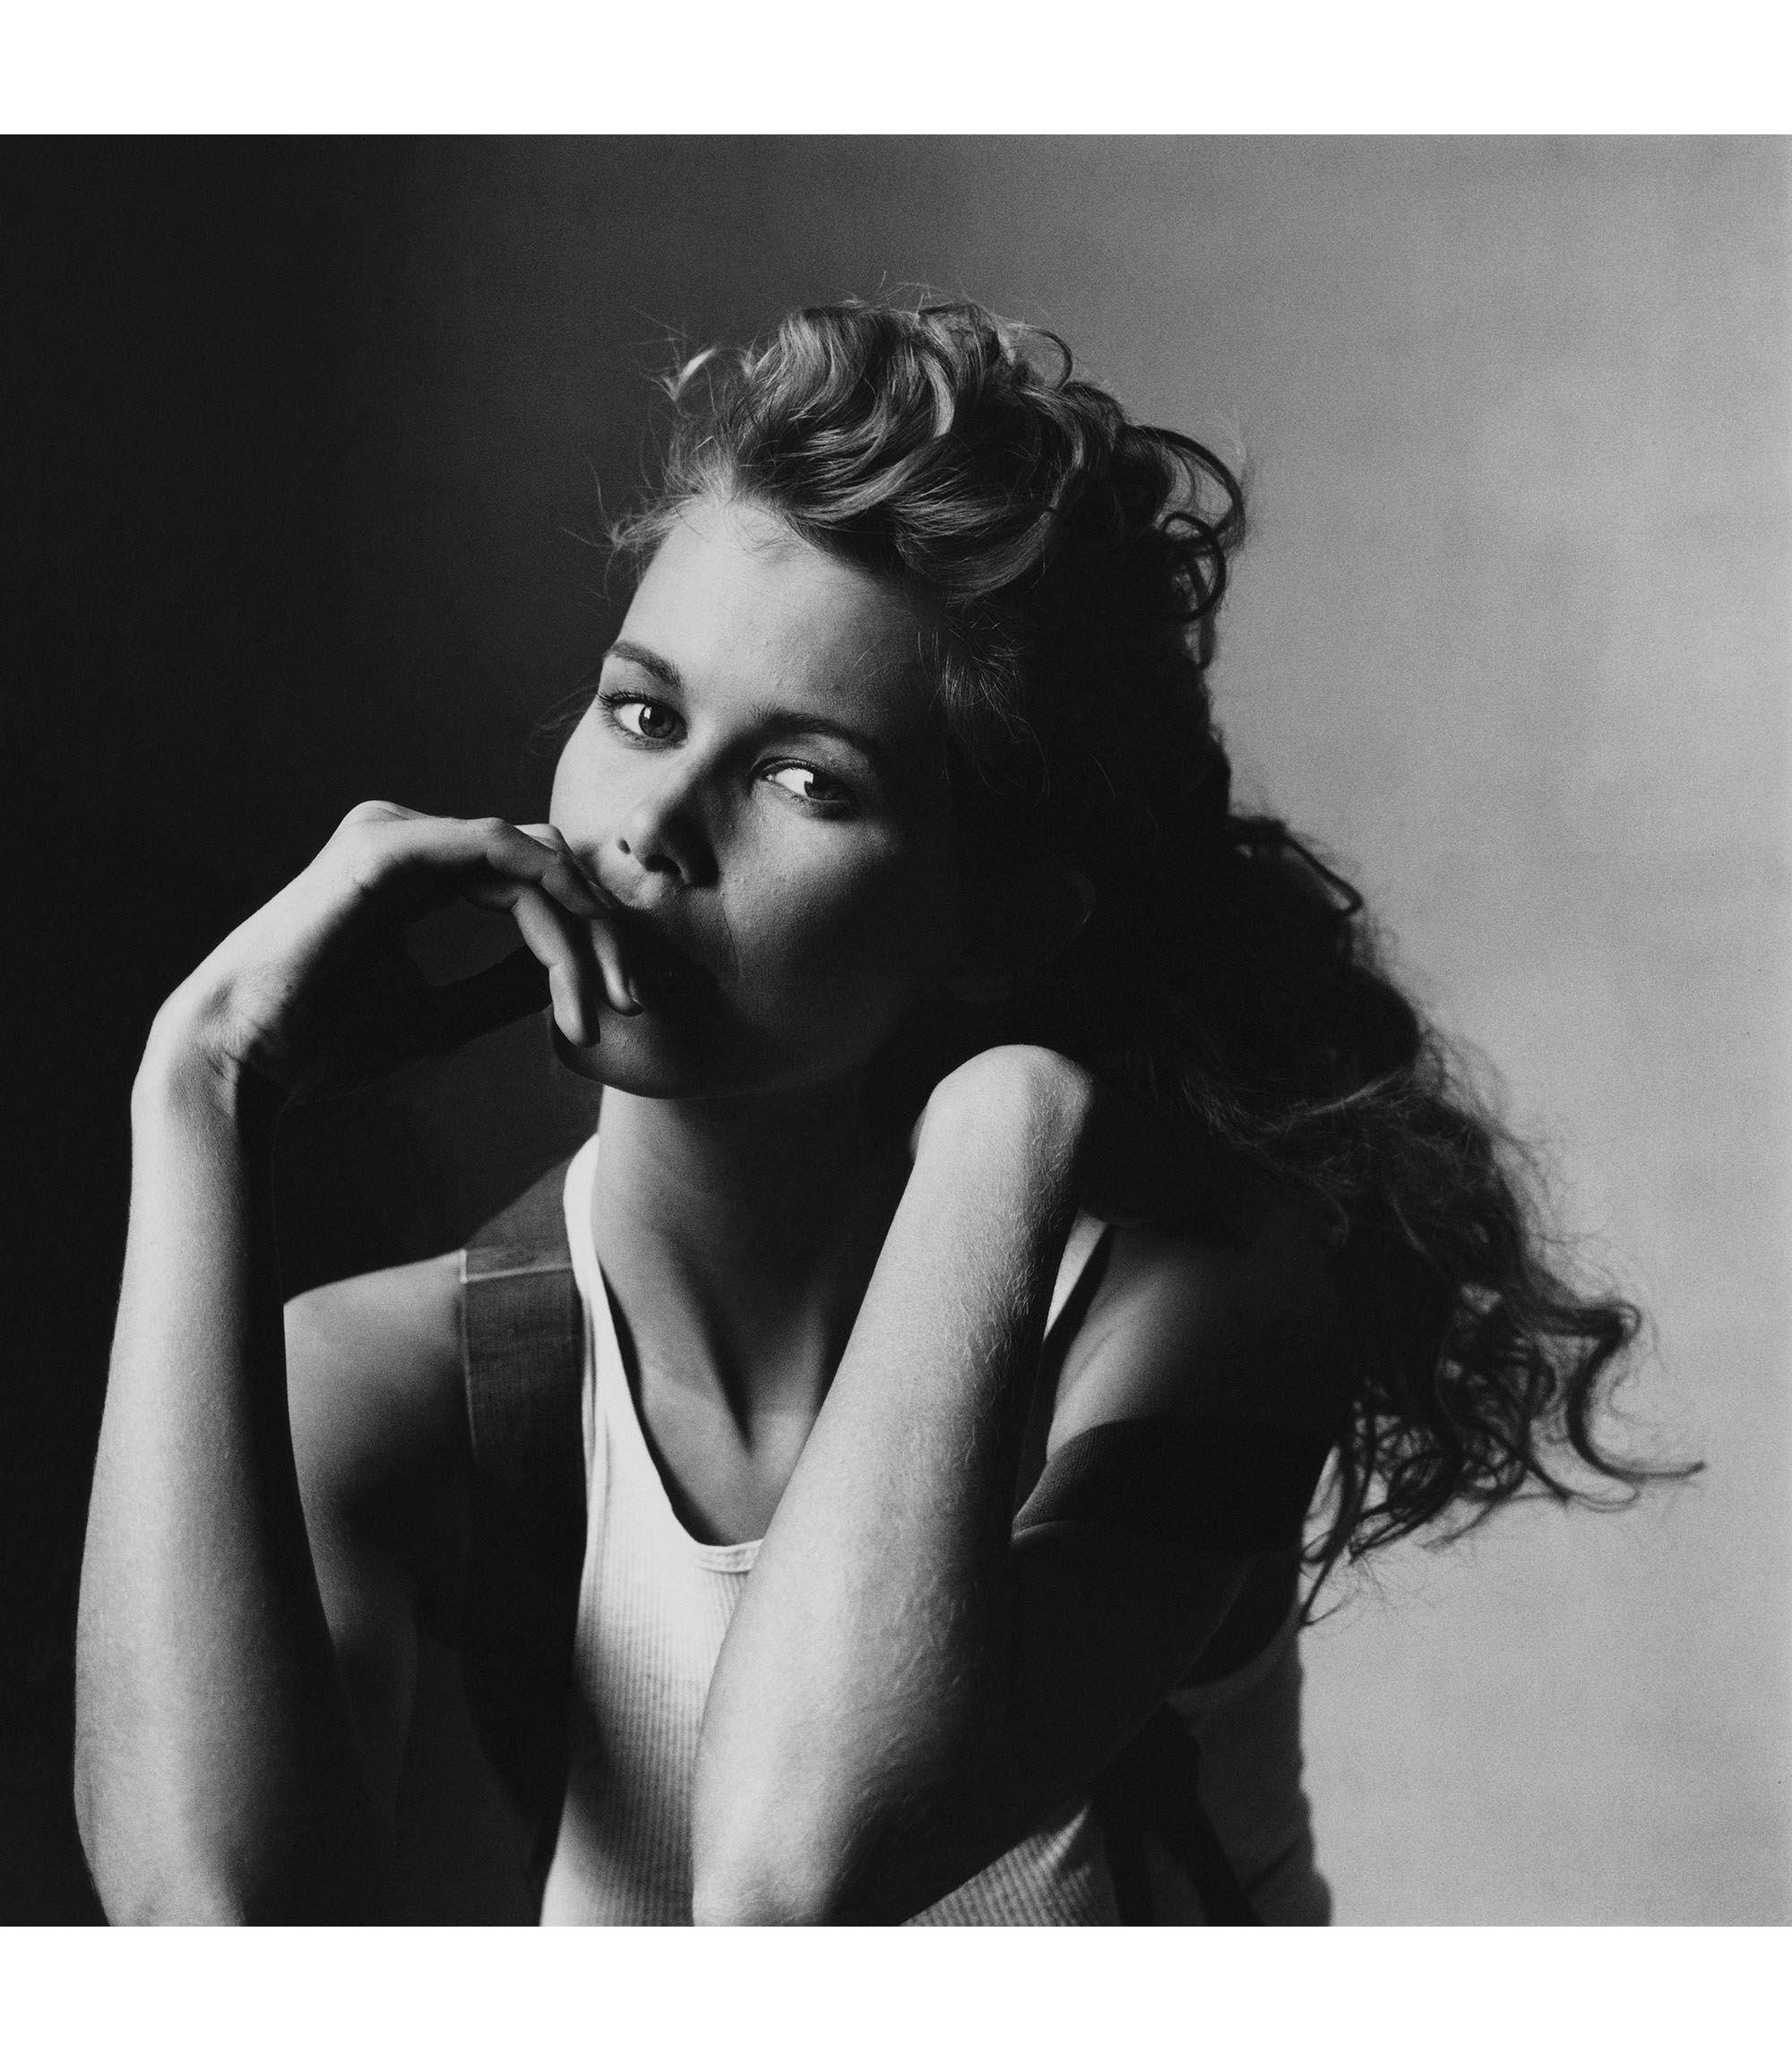 Tatyana Lazareva, actress: biography, personal life, filmography 68